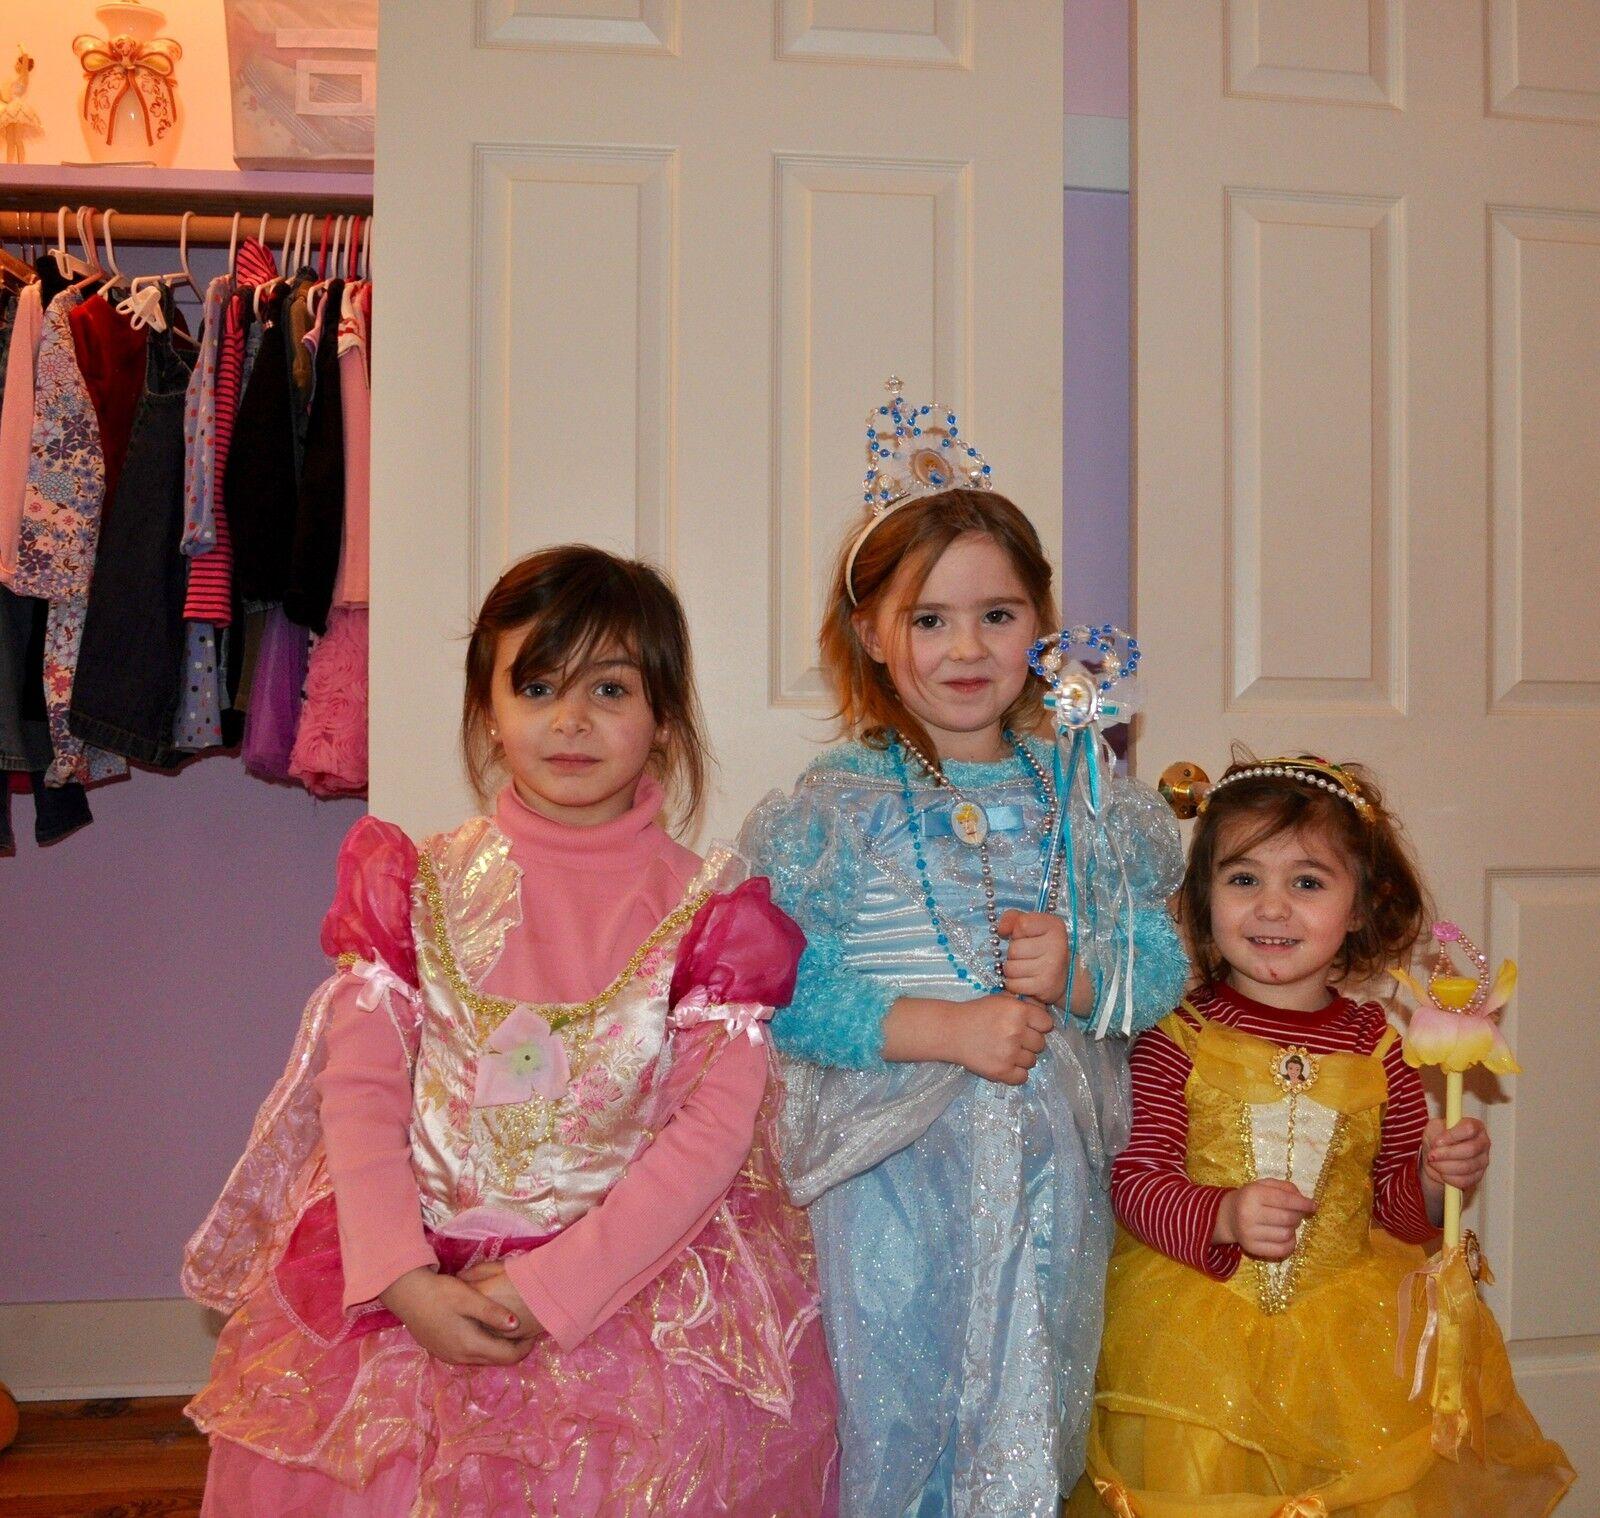 My Daughters Closet 4U